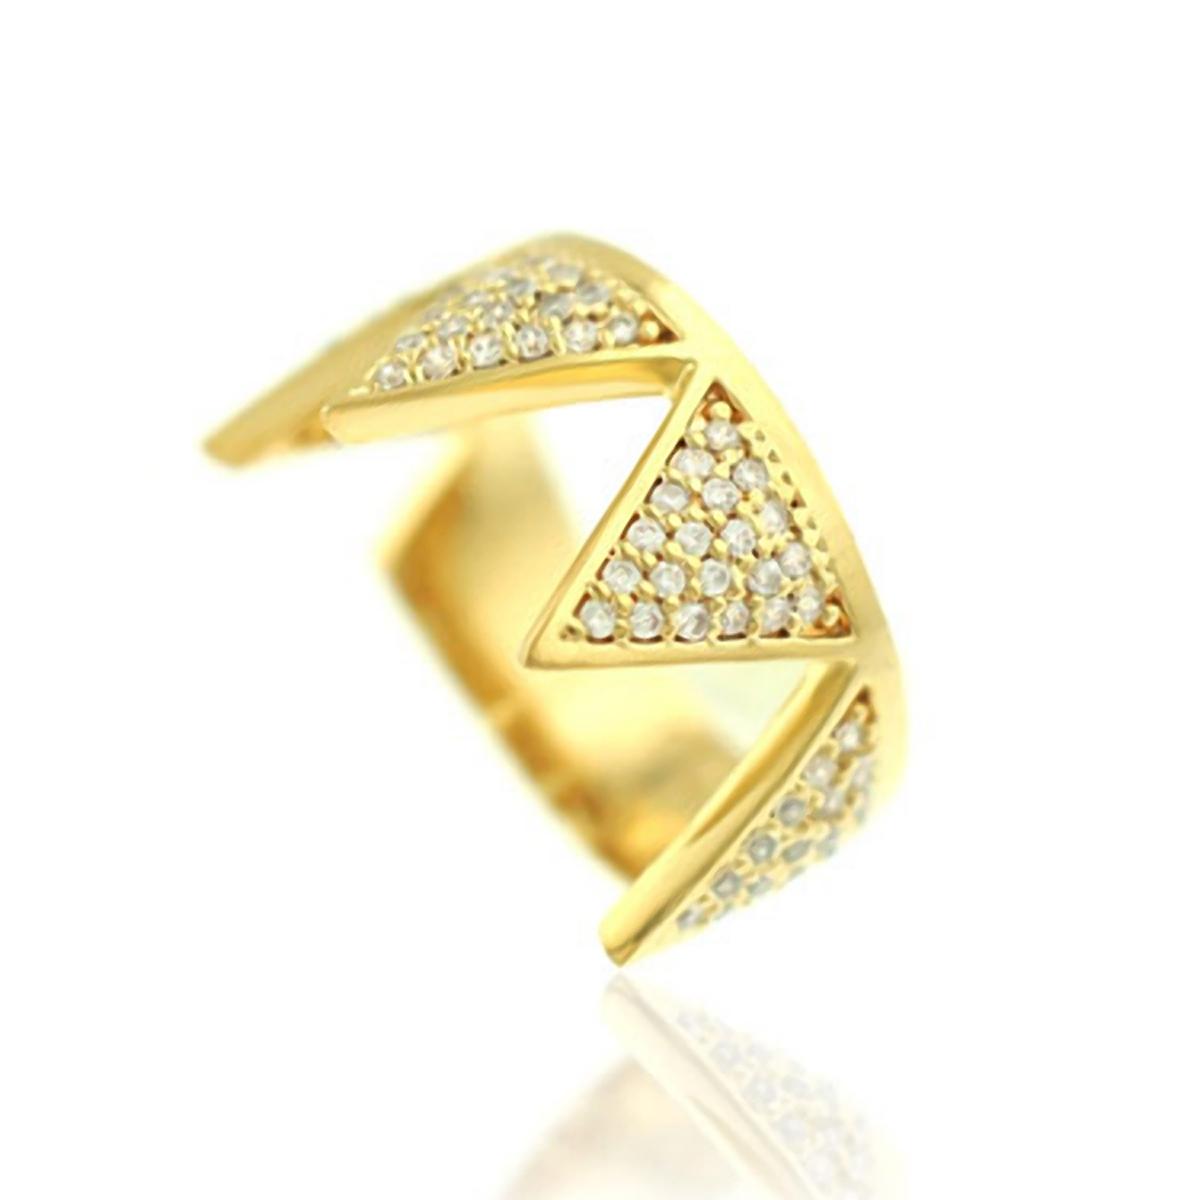 Anel Geométrico Semijoia em Ouro 18K com Micro Zircônia Branca  - SOLOYOU